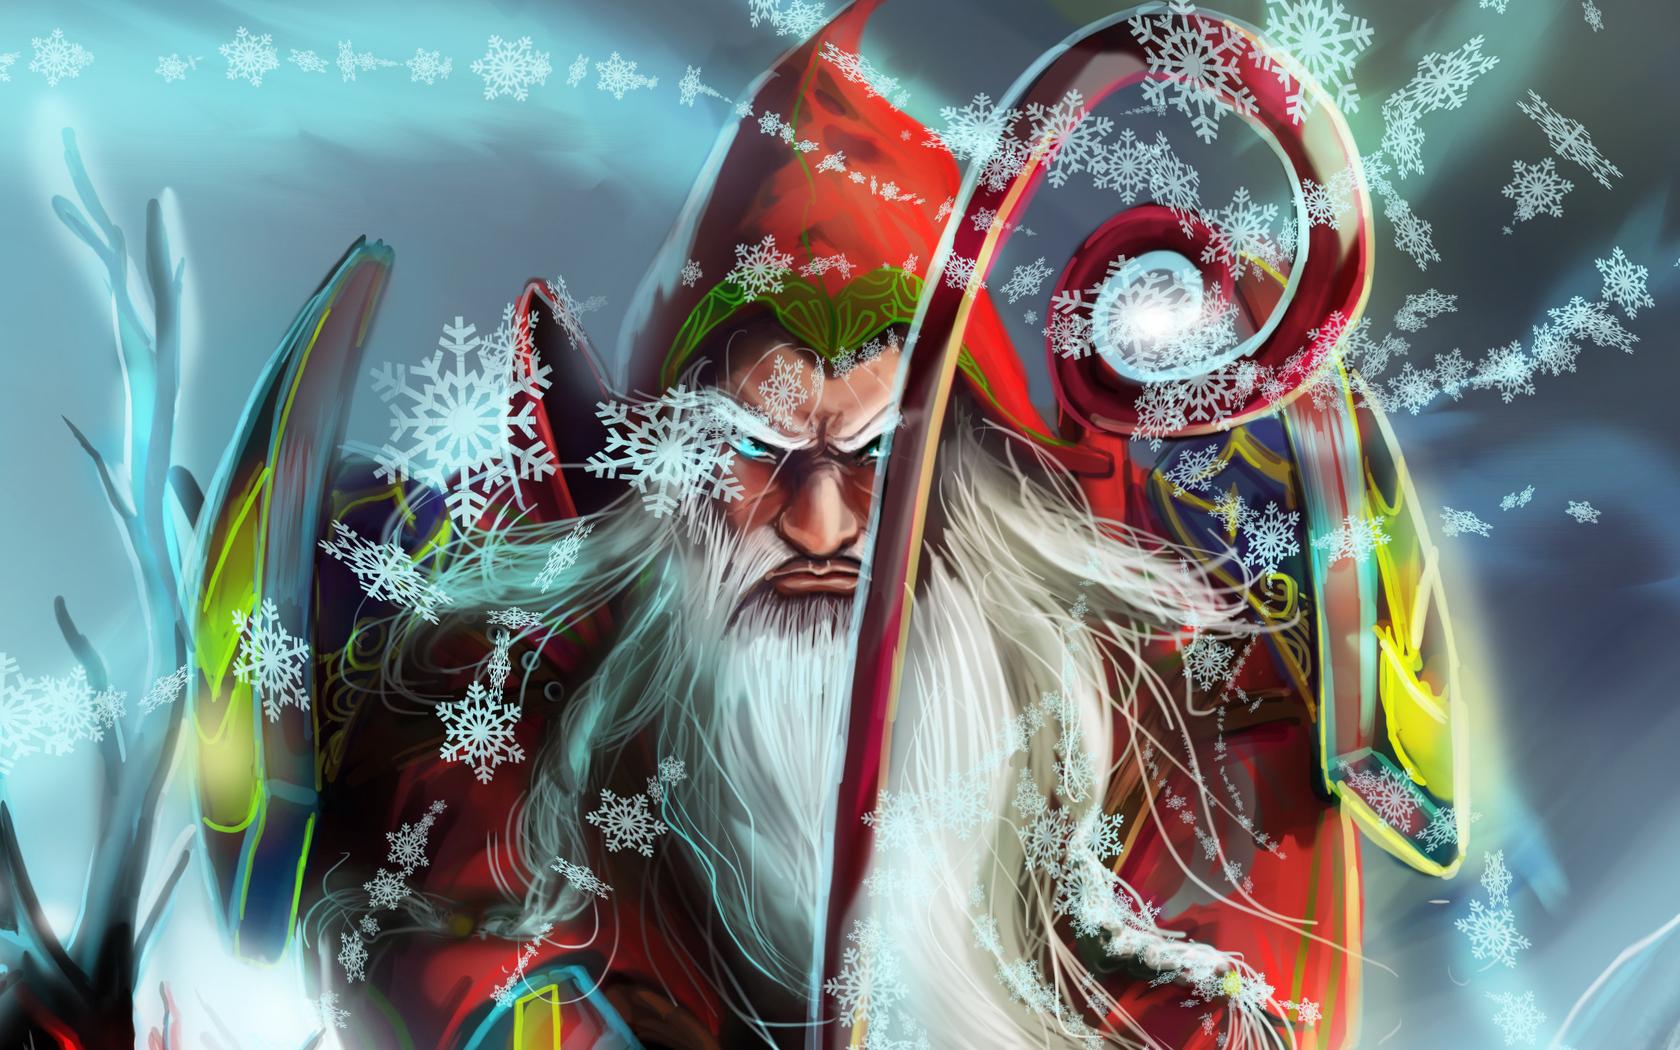 angry-santa-claus-rk.jpg